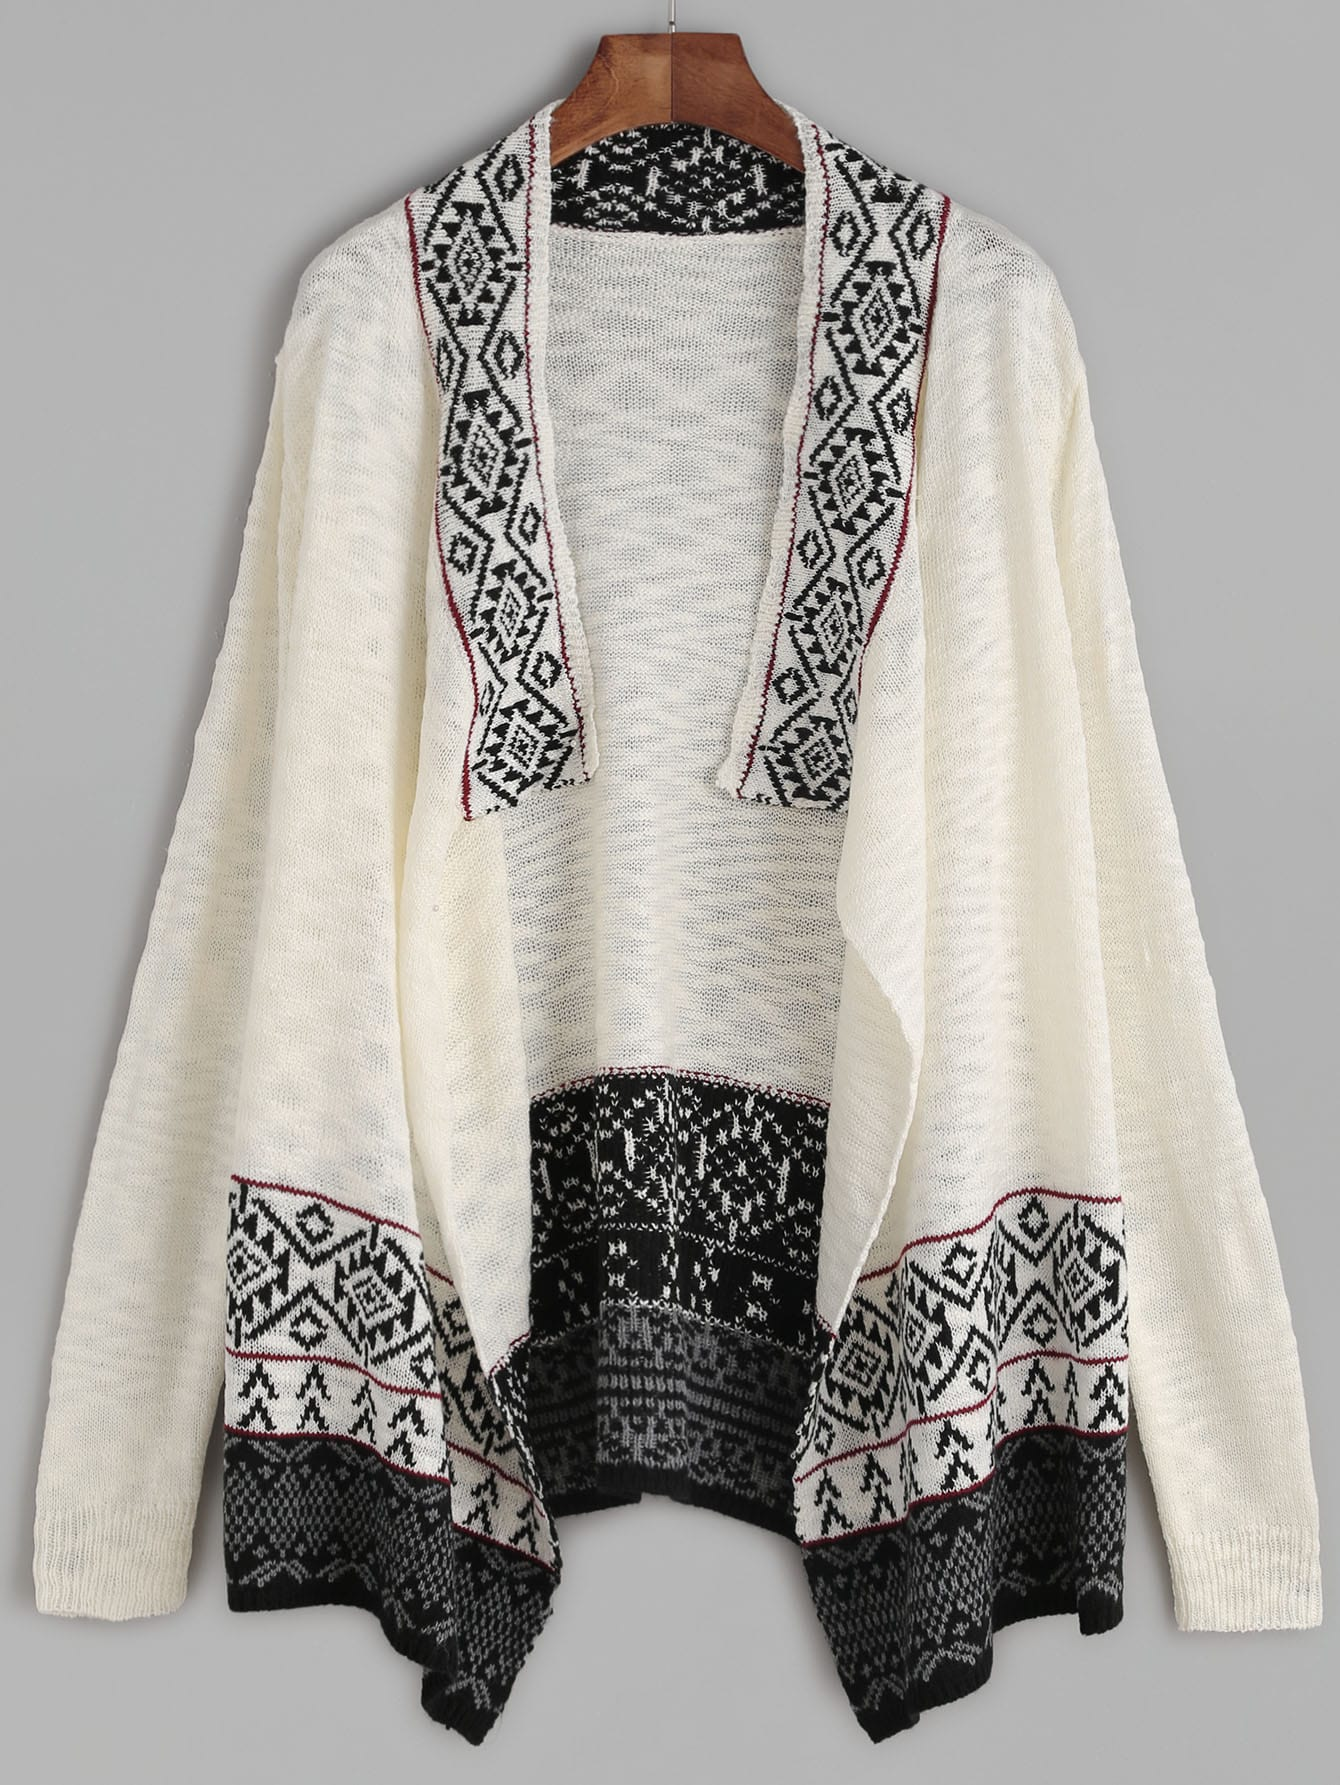 White Contrast Drape Collar Tribal Pattern Sweater CoatWhite Contrast Drape Collar Tribal Pattern Sweater Coat<br><br>color: White<br>size: one-size